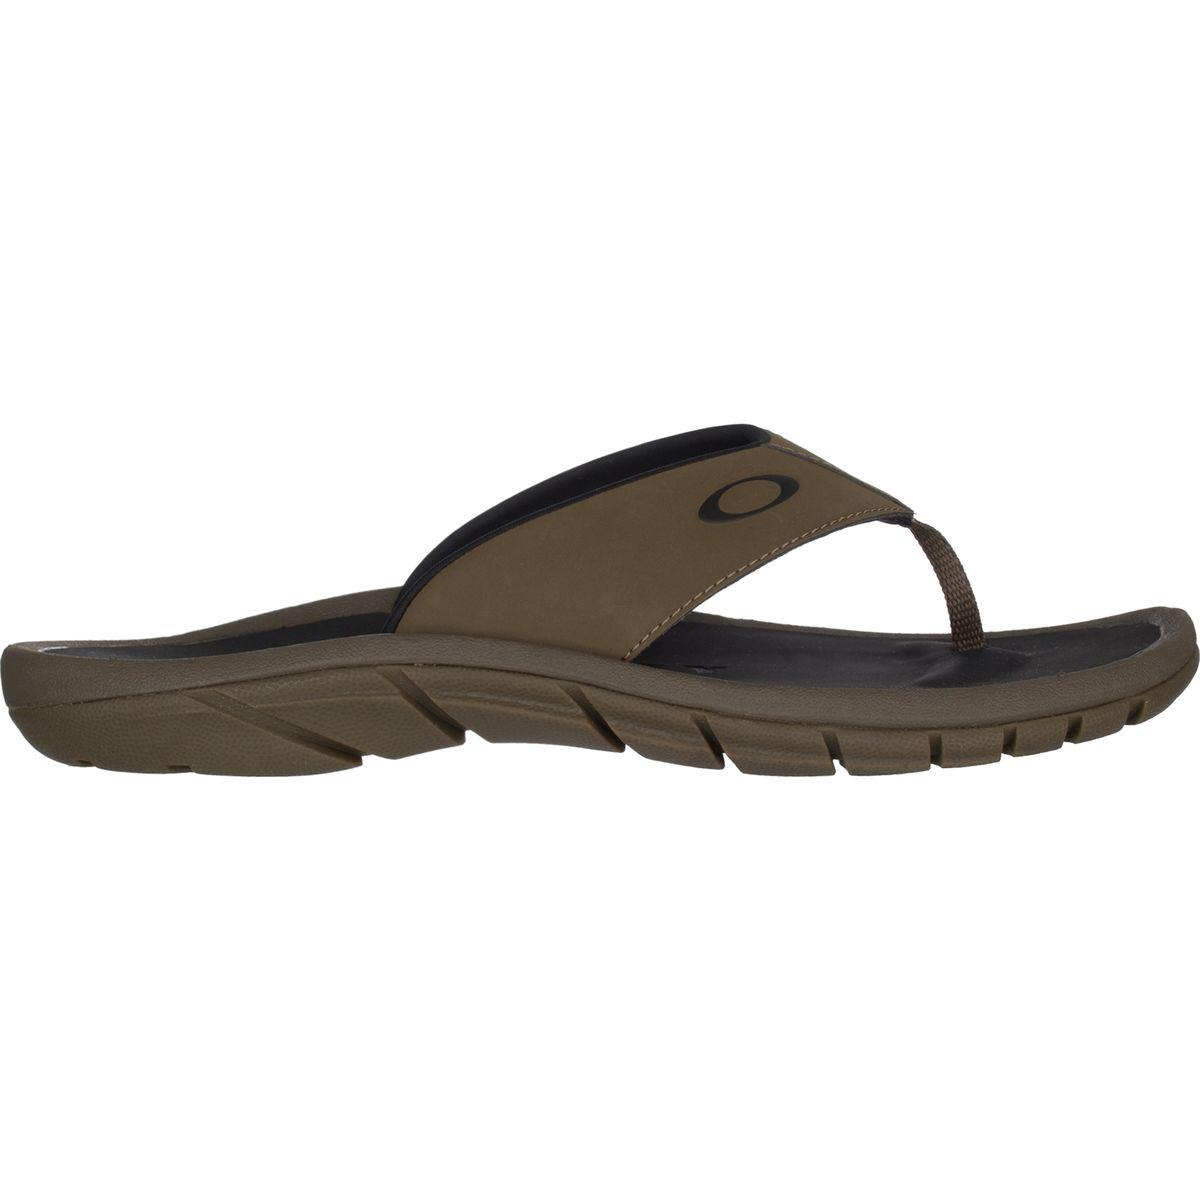 255cb4126f Lyst - Oakley Super Coil 2.0 Sandal in Brown for Men